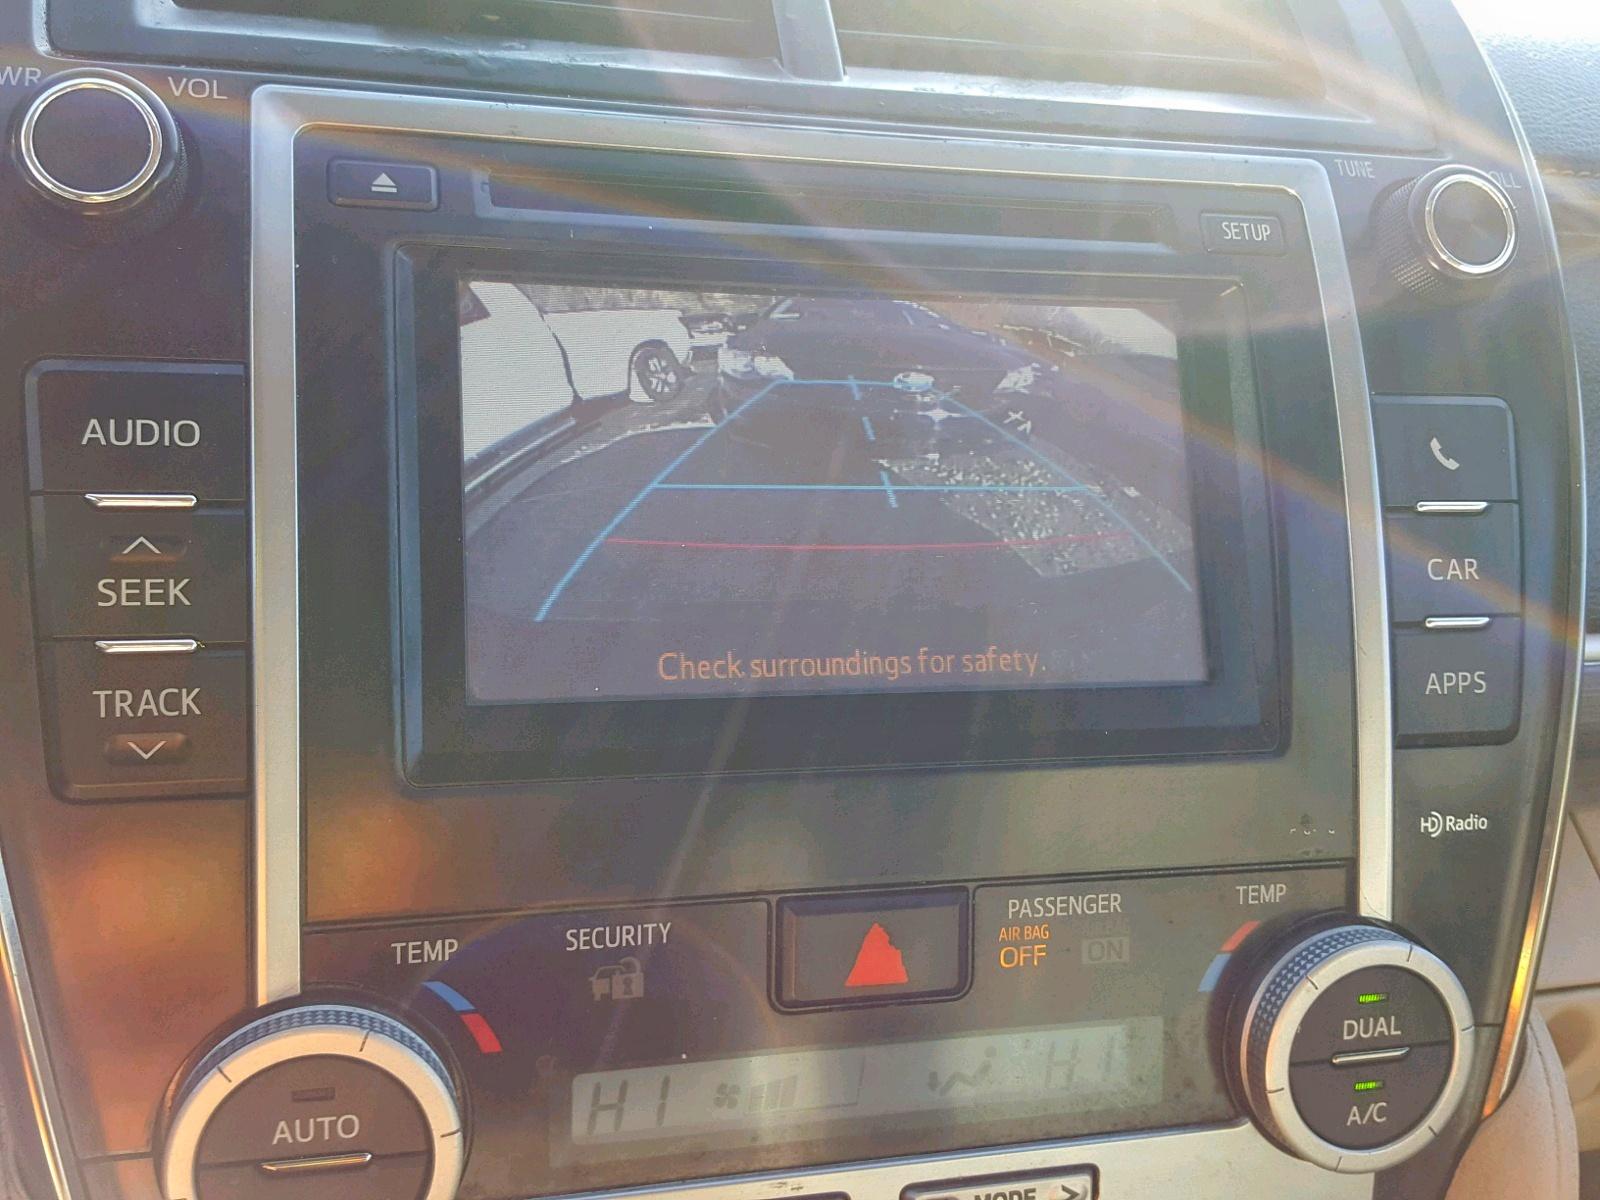 2014 Toyota Camry Hybr 2.5L engine view